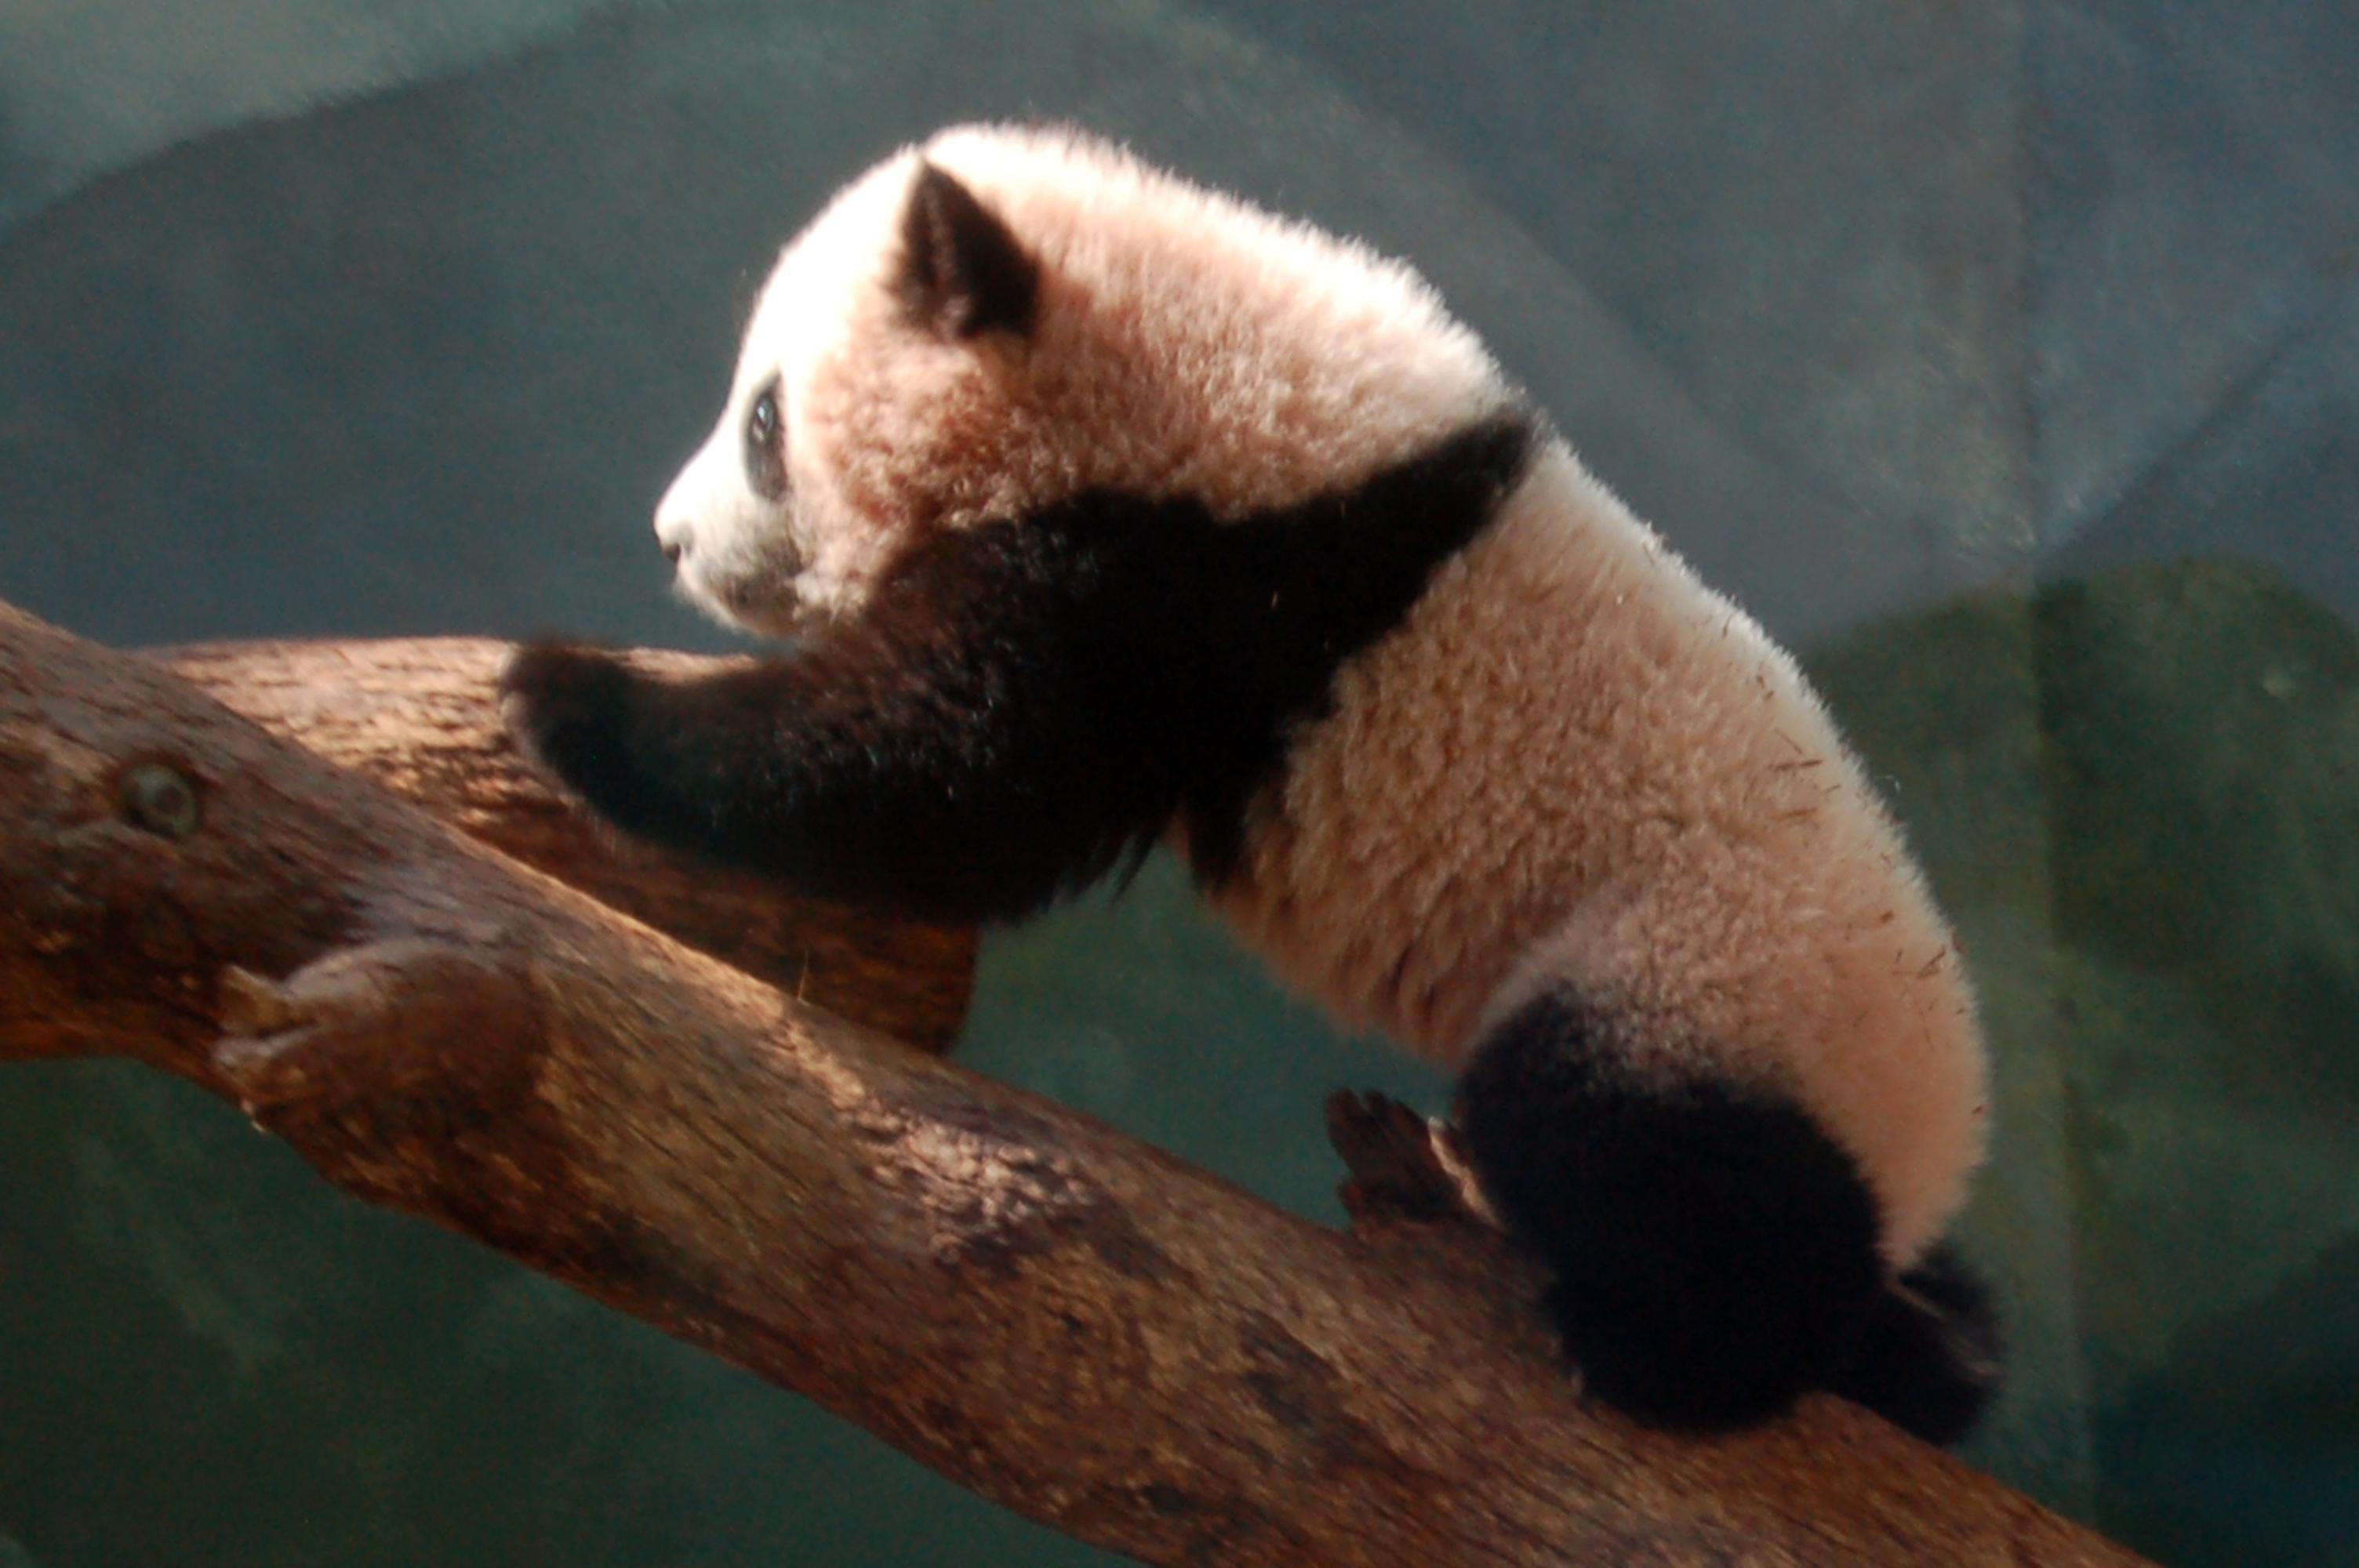 pandapo.jpg - baby panda, Po